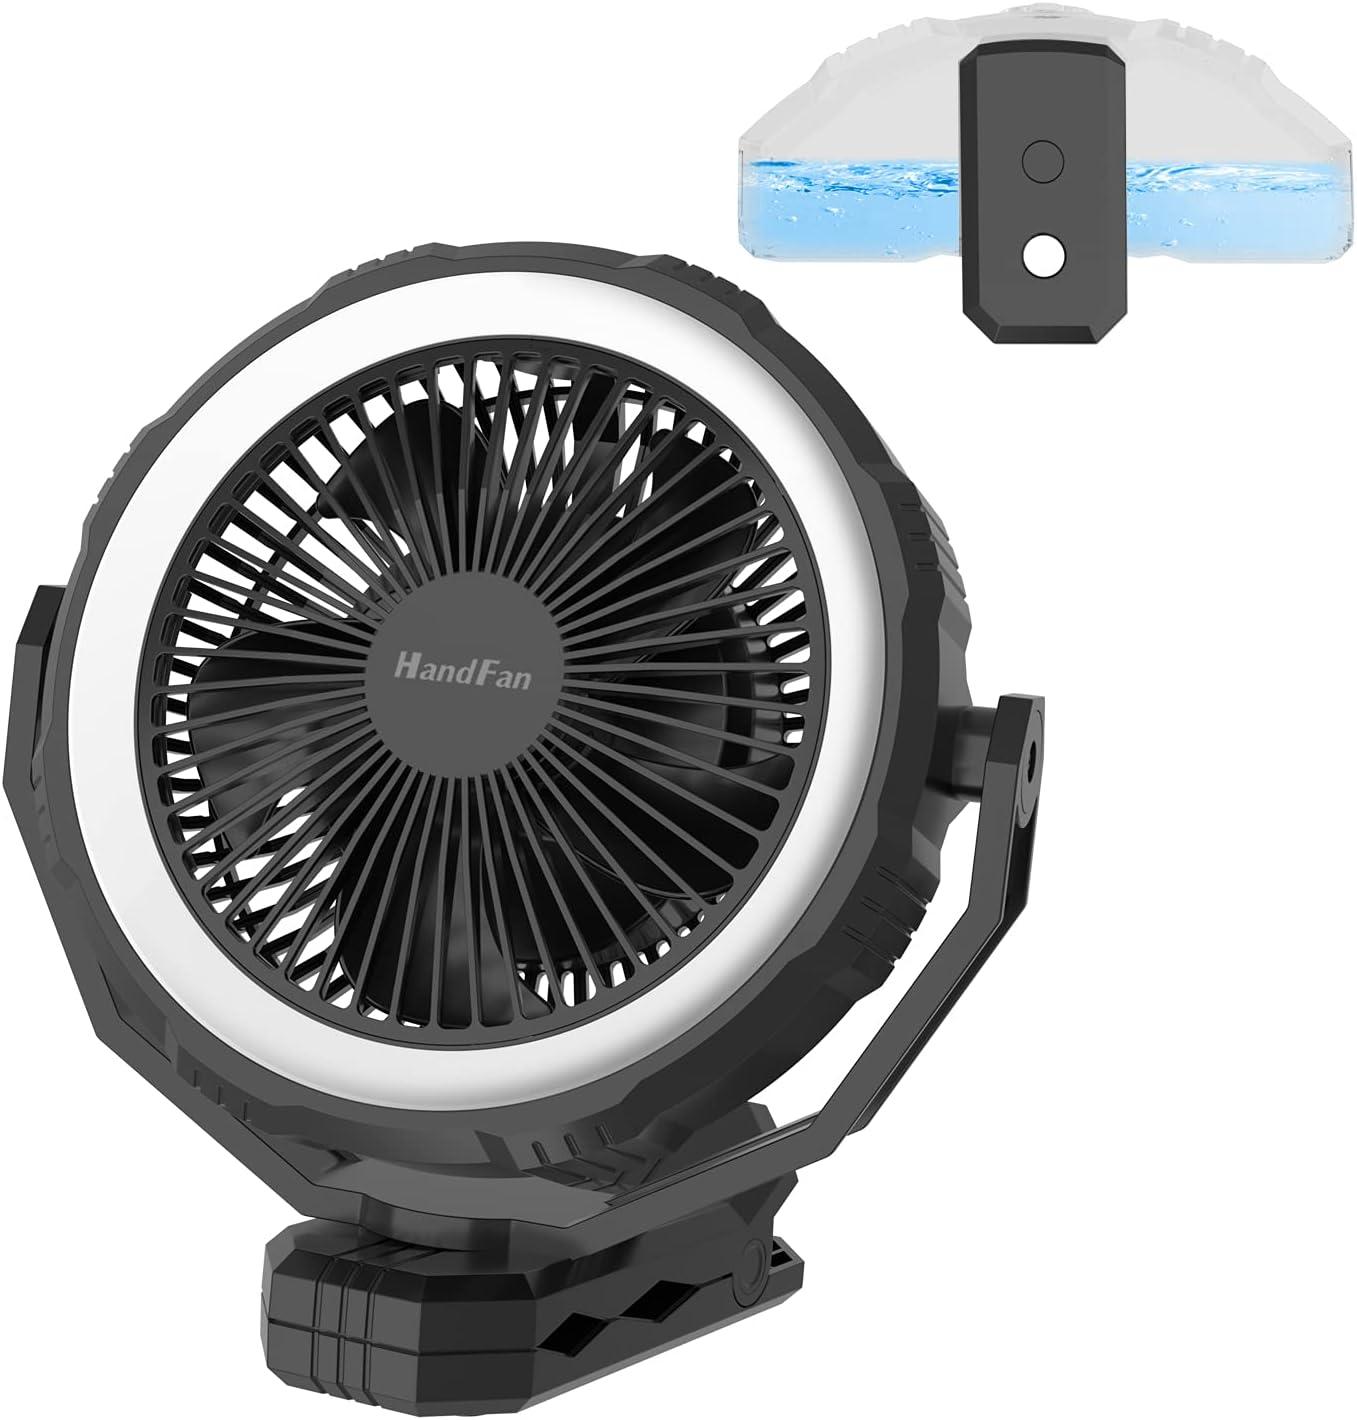 10000mAh Portable Sales Misting Fan 8-Inch on Reinforced Translated Clip Des